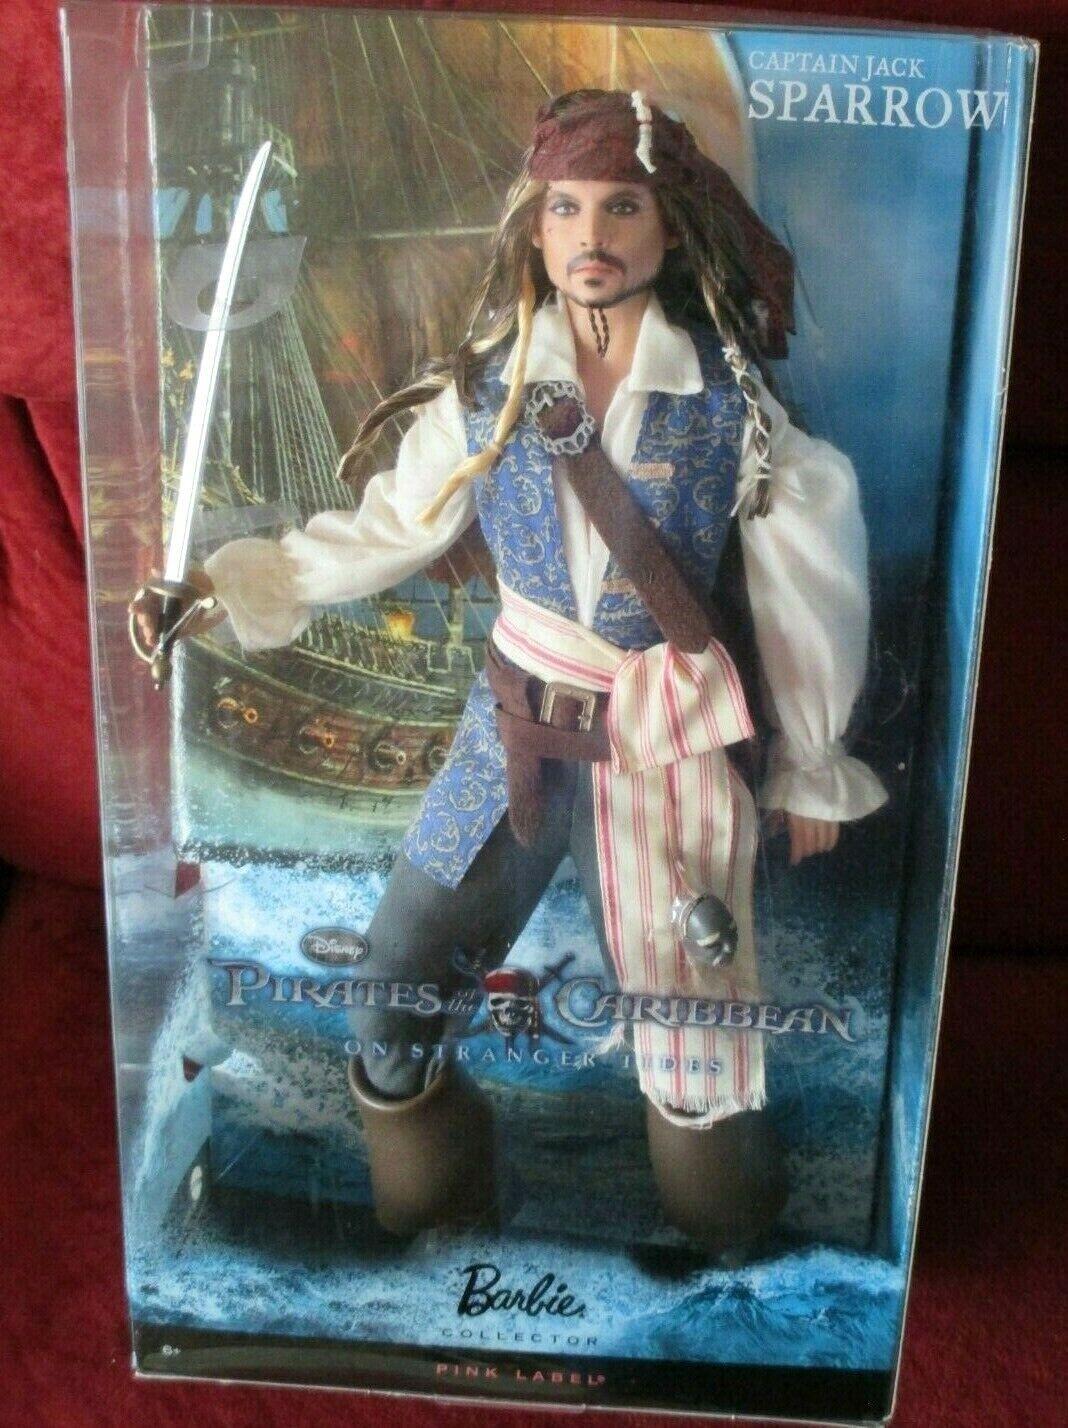 Captain Jack Sparrow doll OOAK Doll Jack Sparrow Textile doll Captain Jack Sparrow Art doll pirate Jack Interior doll Jack Sparrow